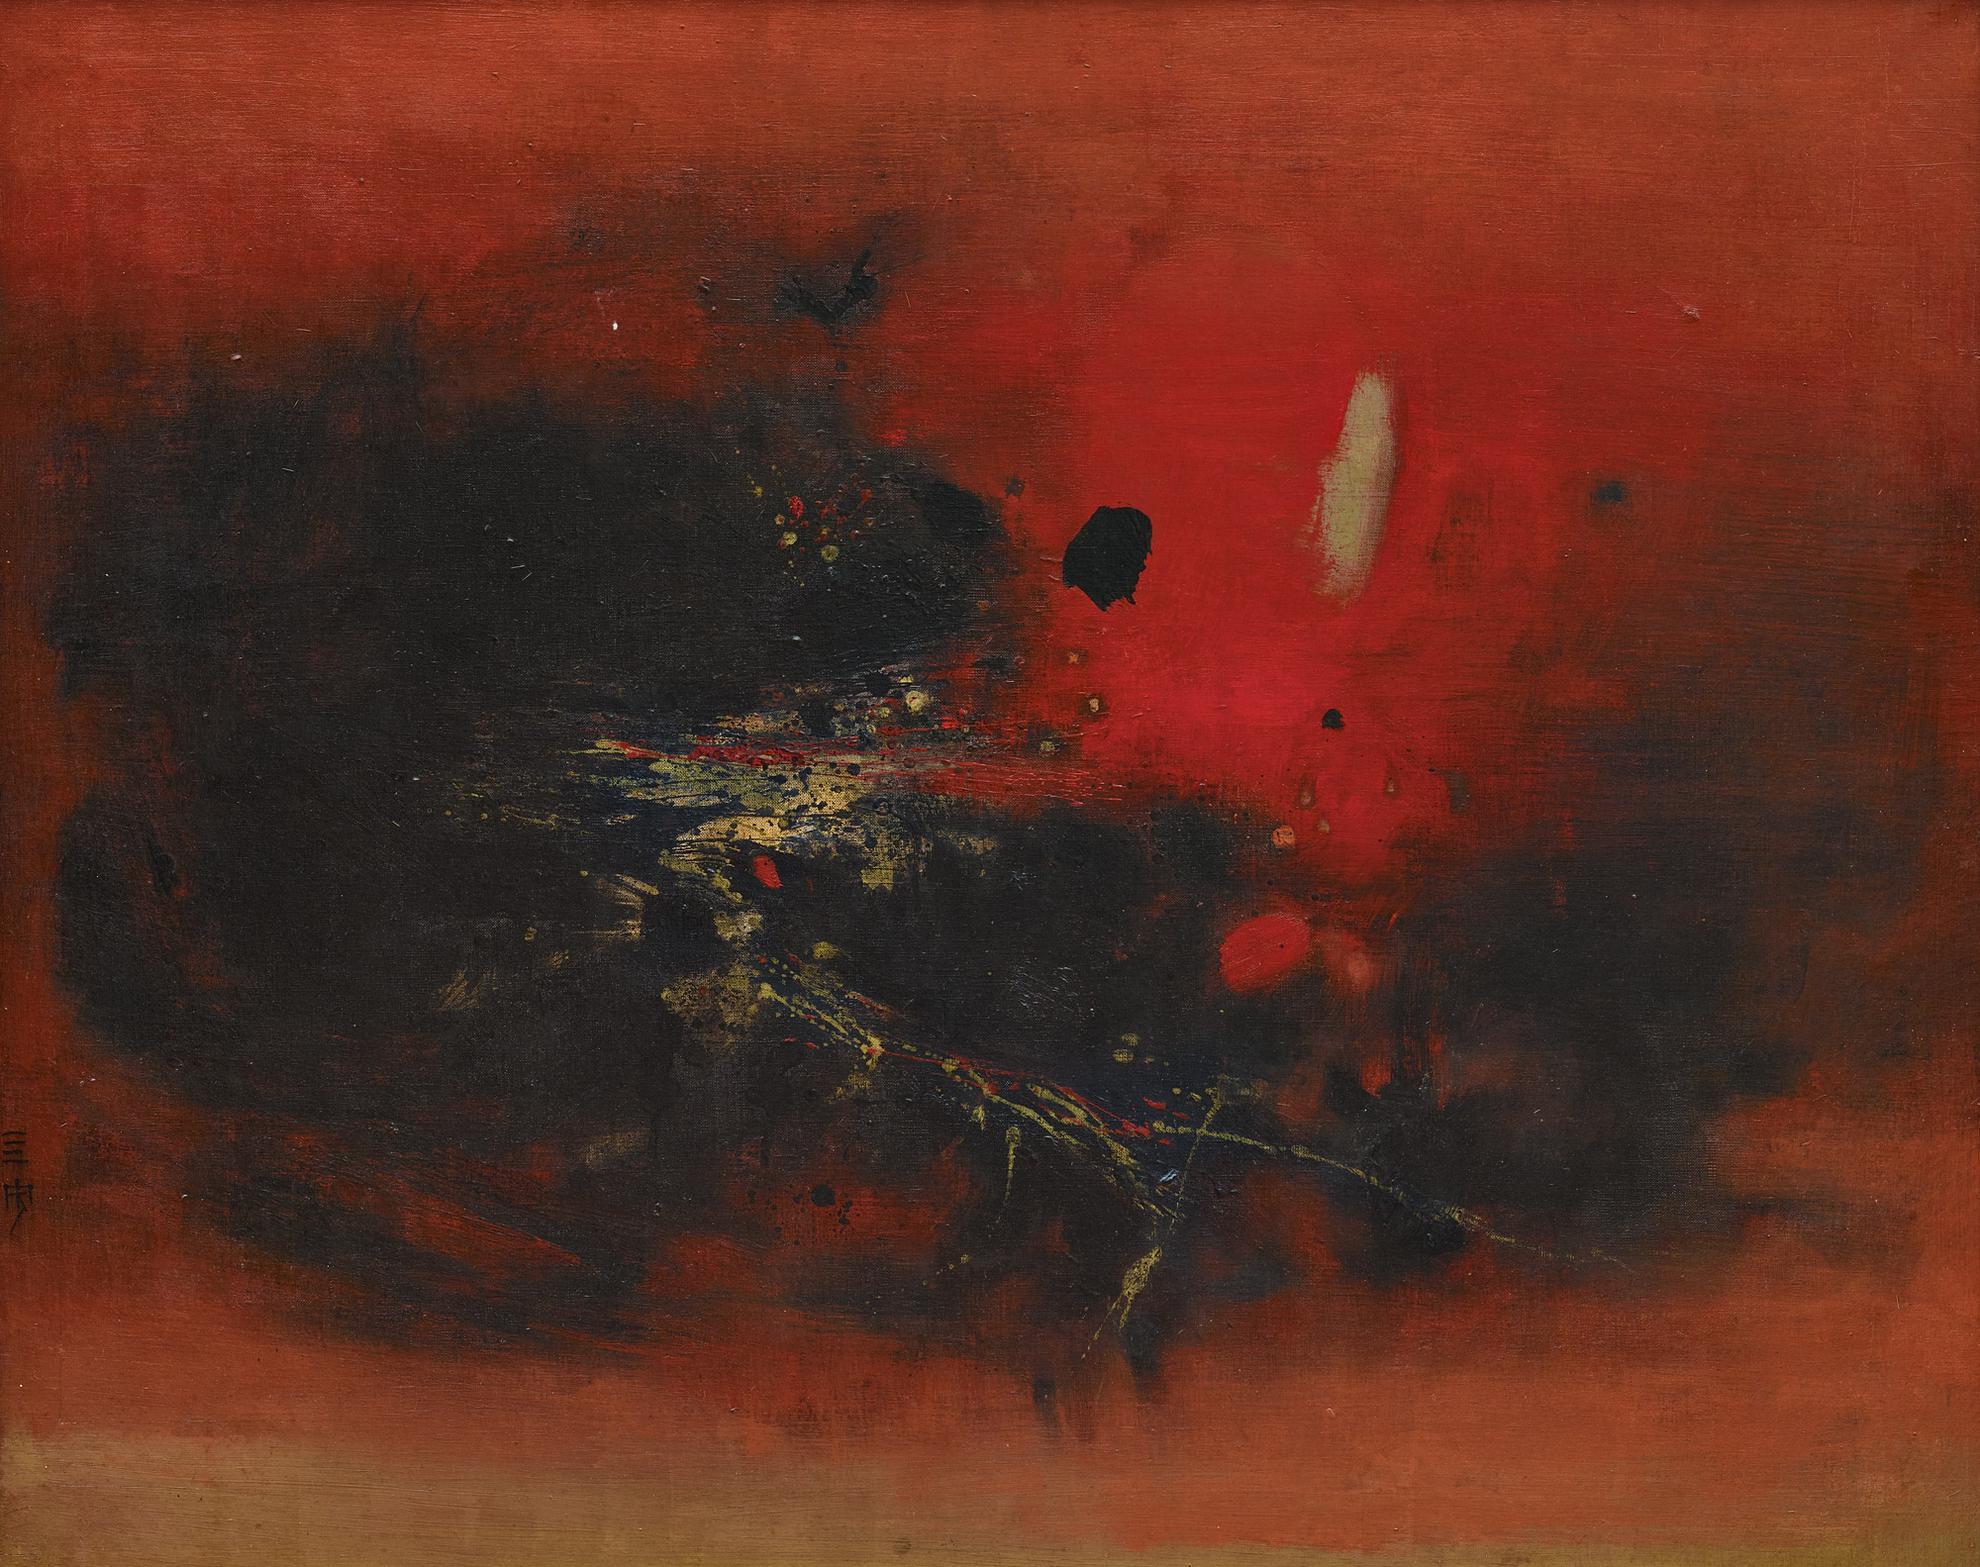 Cheong Soo Pieng-Nature-1963